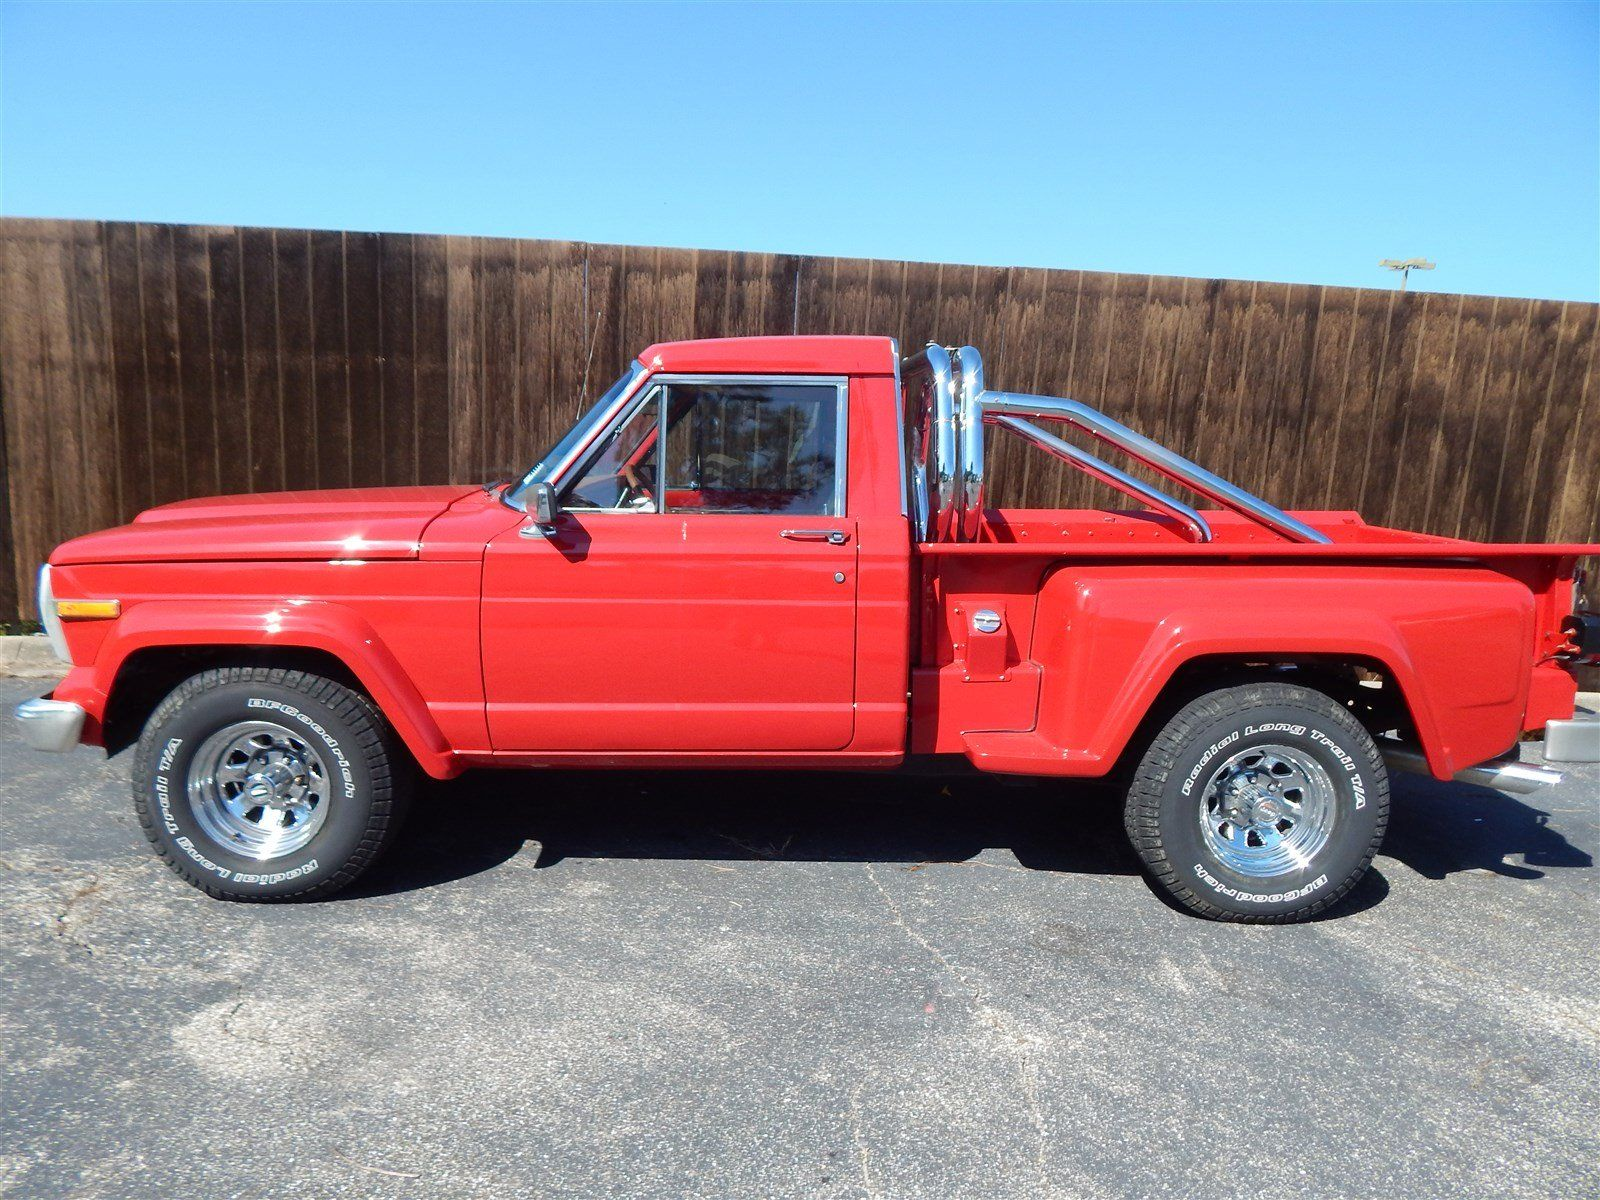 Cars For Sale Used 1983 Jeep Pickup In Bainbridge Ga 39817